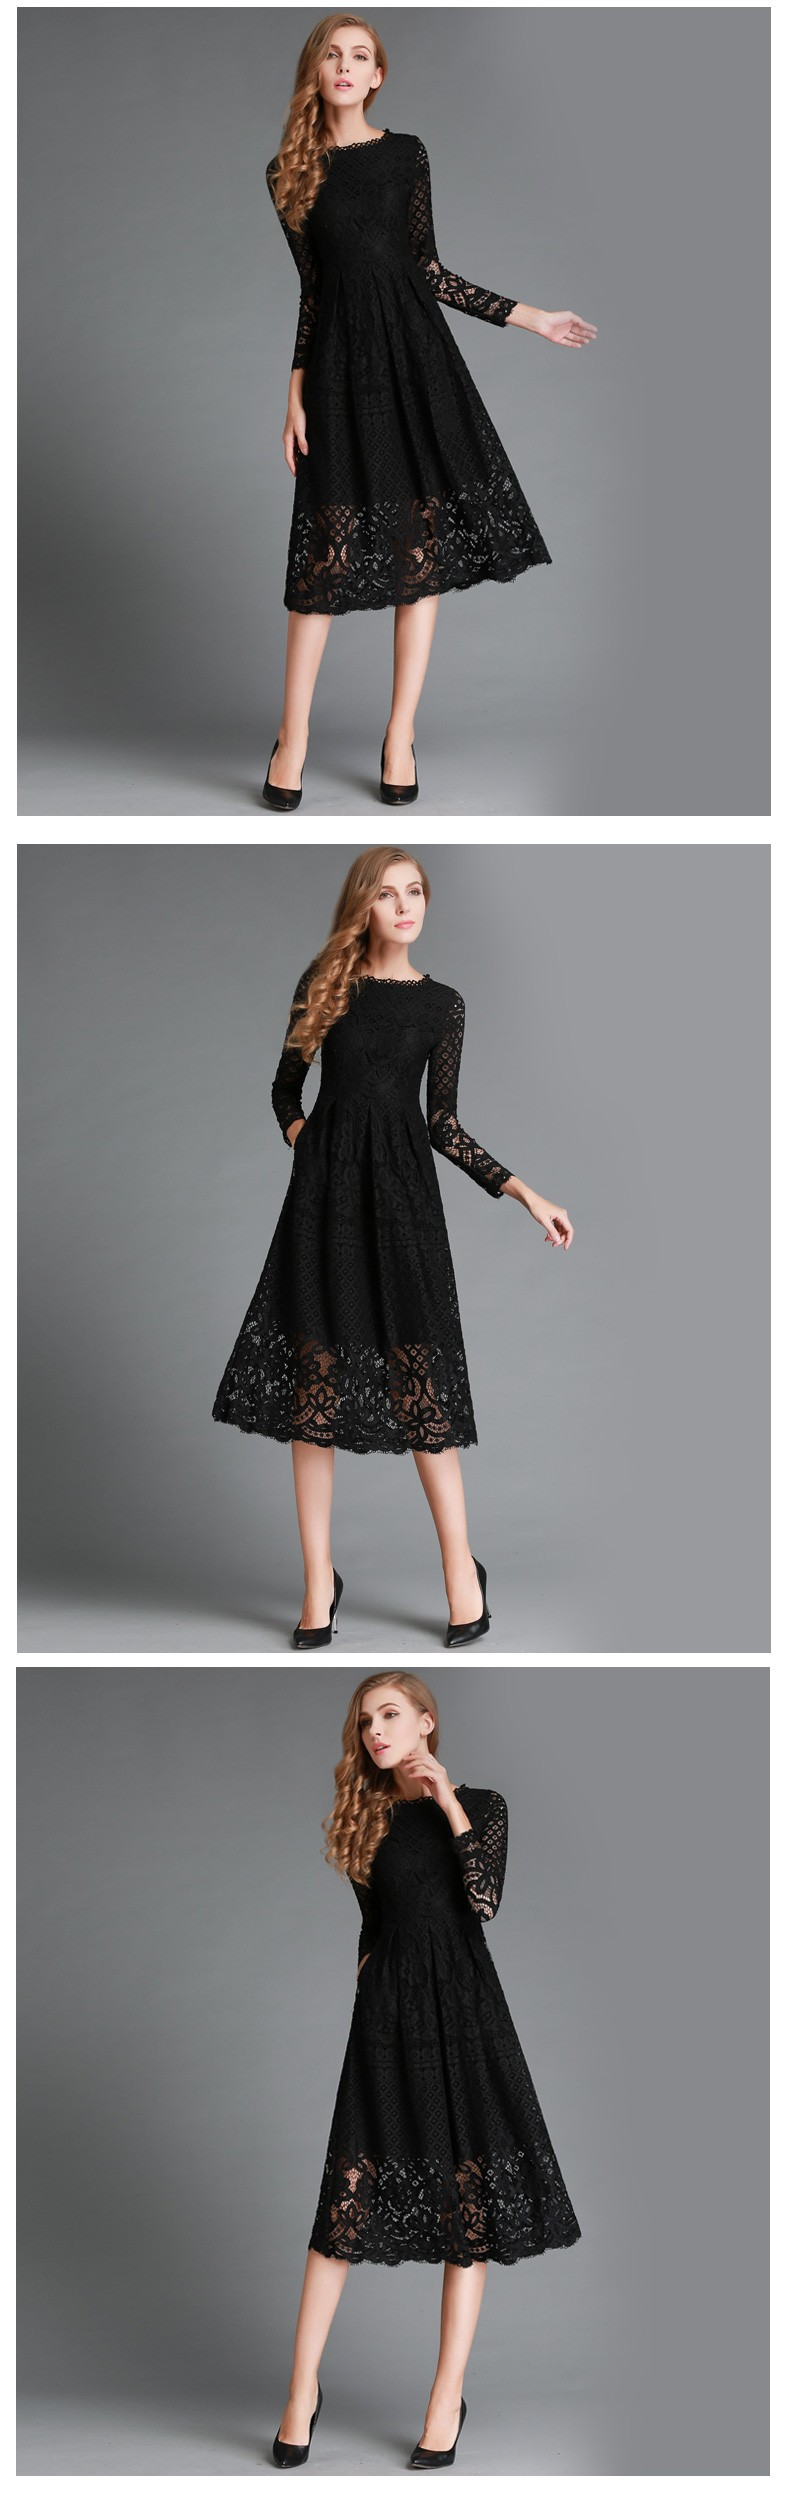 Beauty Long Sleeved Lace Dress 8